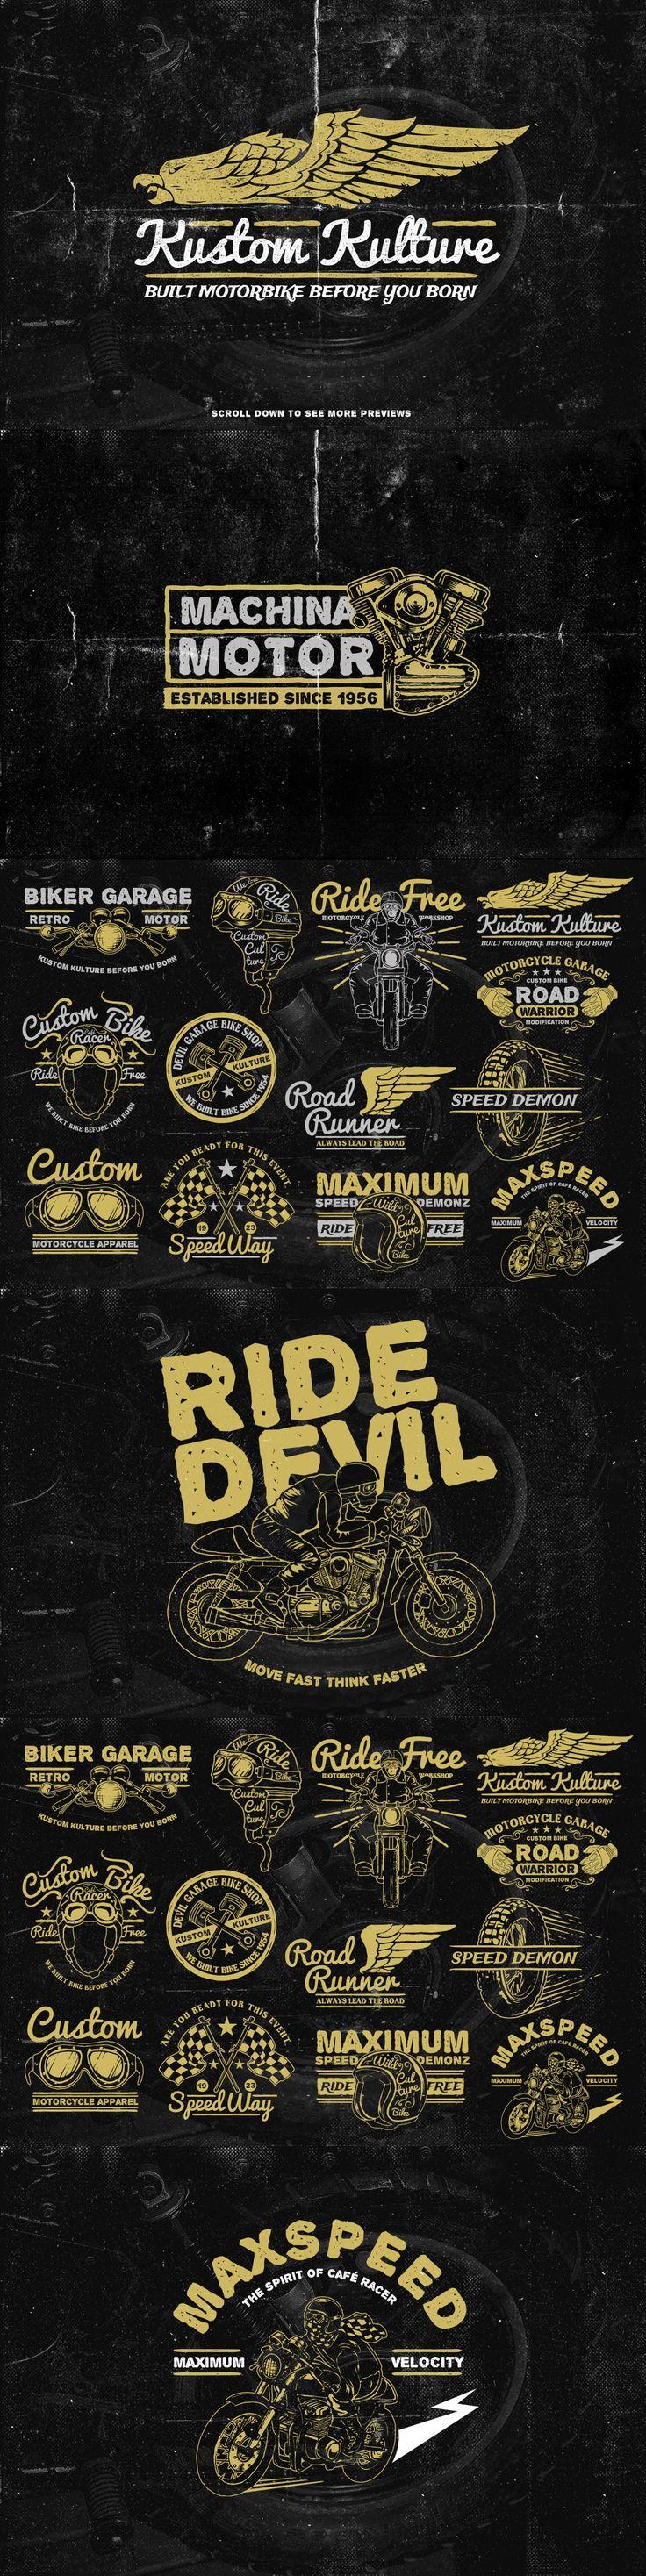 The Retro Bike + 20 Bonus by TSV Creative on Creative Market